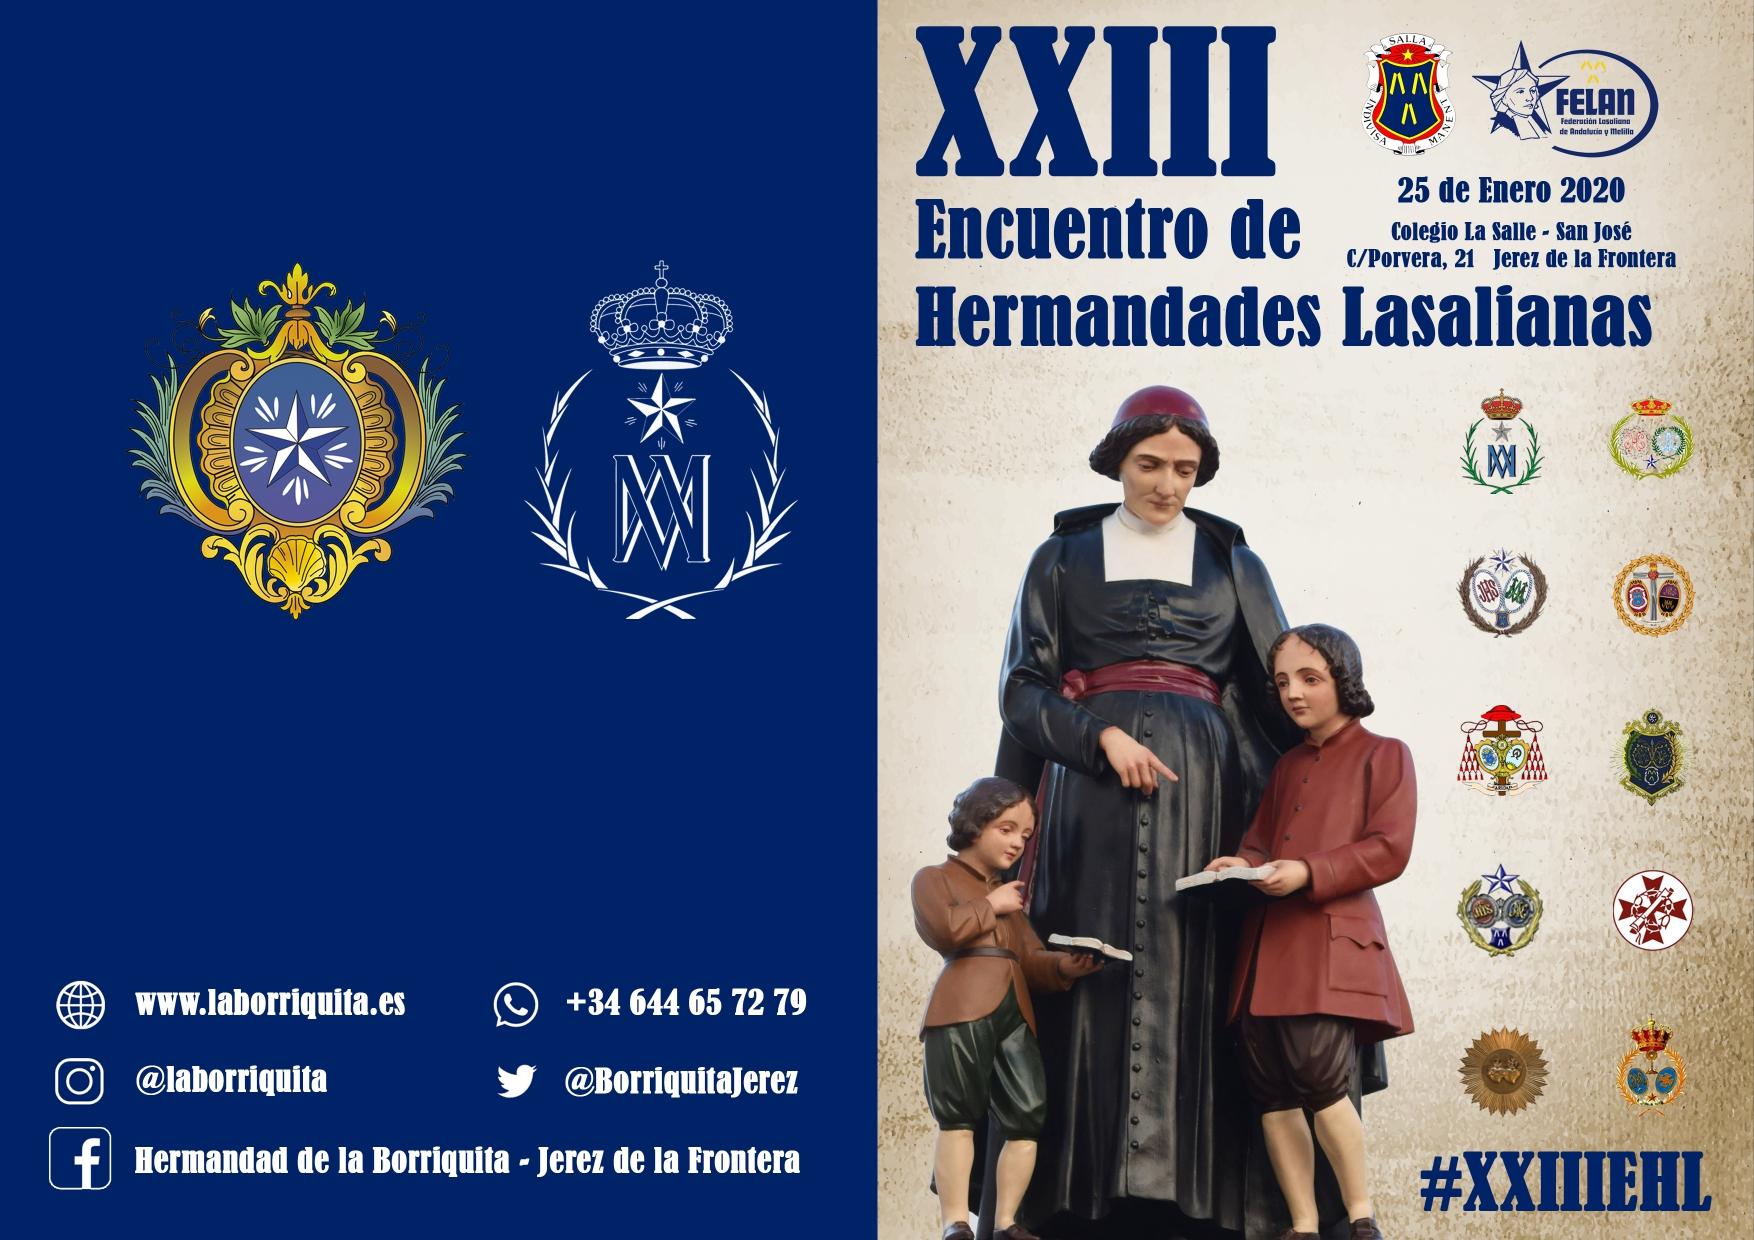 XXIII ENCUENTRO HERMANDADES LASALIANAS DE FELAN EN JEREZ